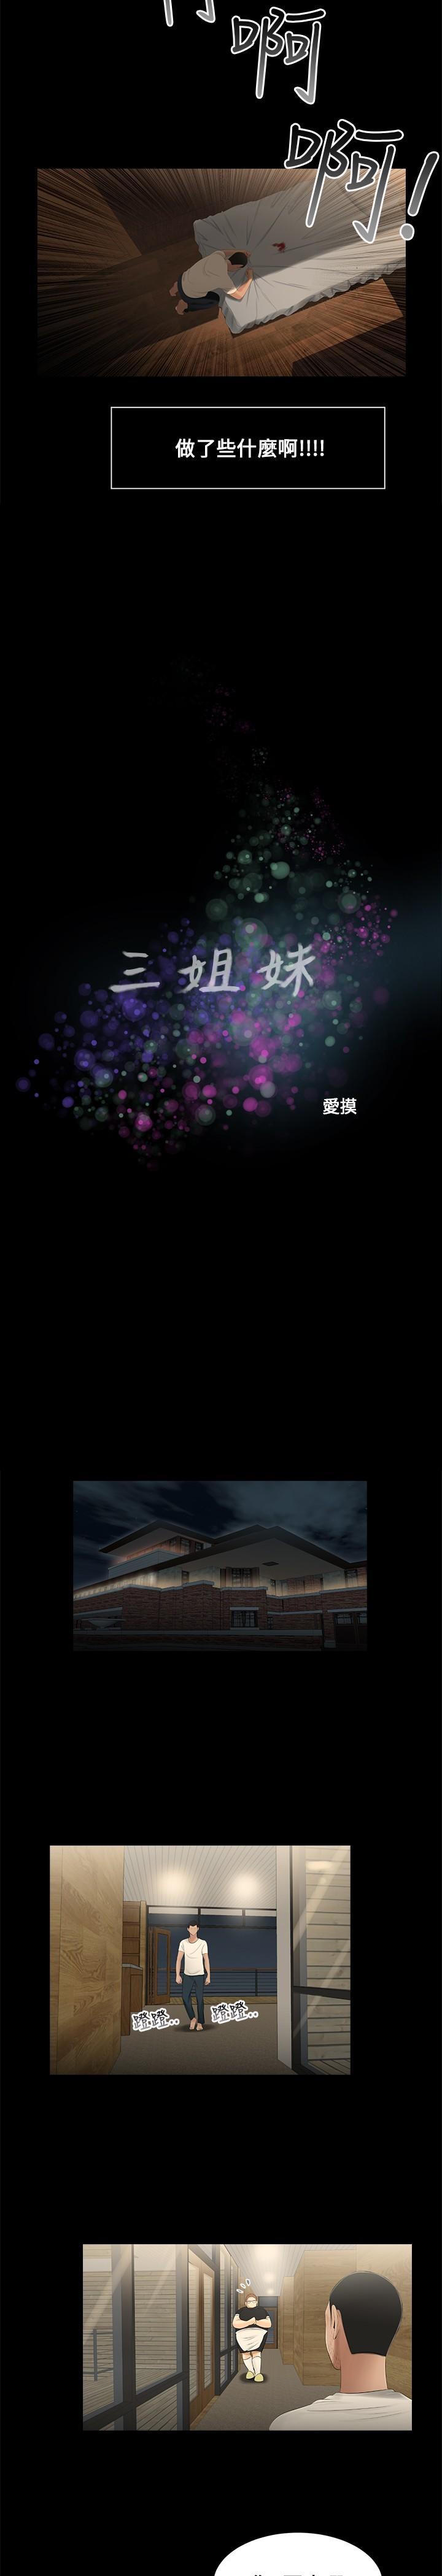 Three sisters 三姐妹Ch.13~19 (Chinese)中文 97